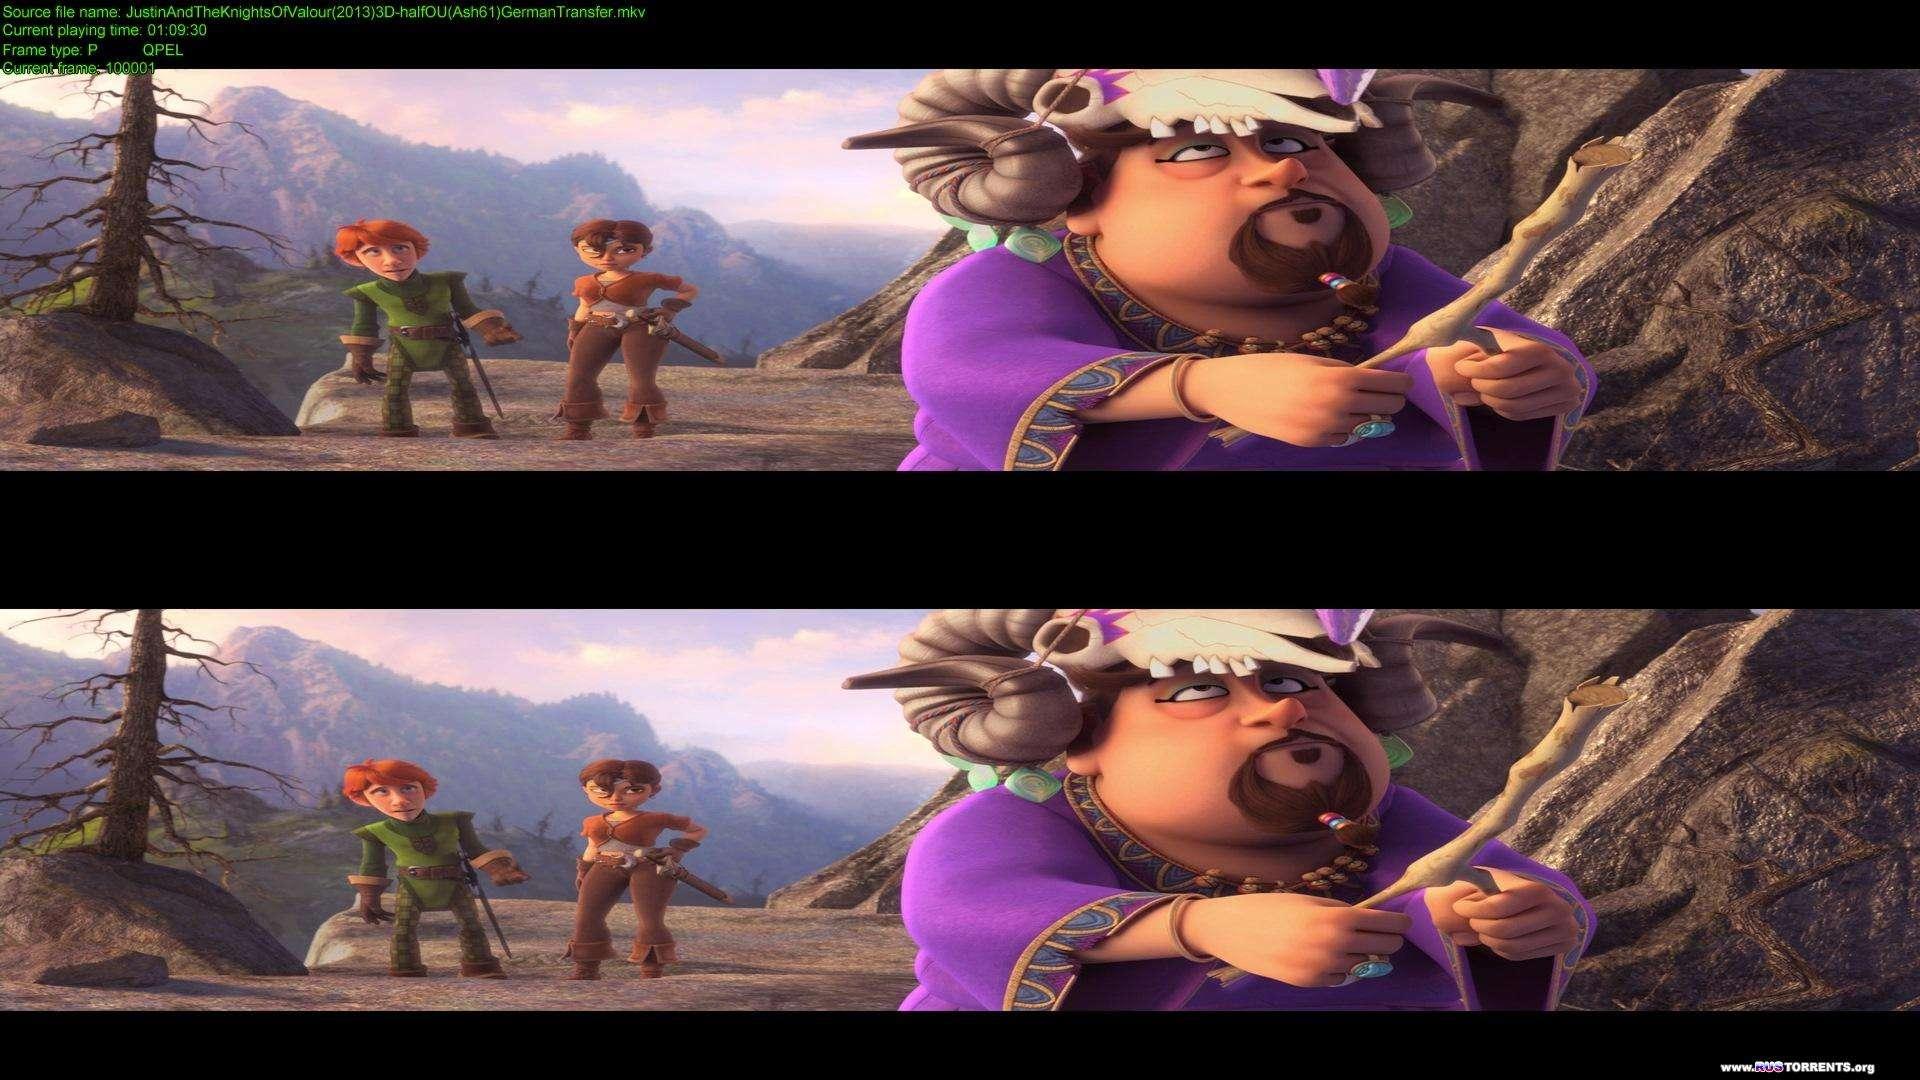 Джастин и рыцари доблести | BDRip 1080p | 3D-Video | halfOU